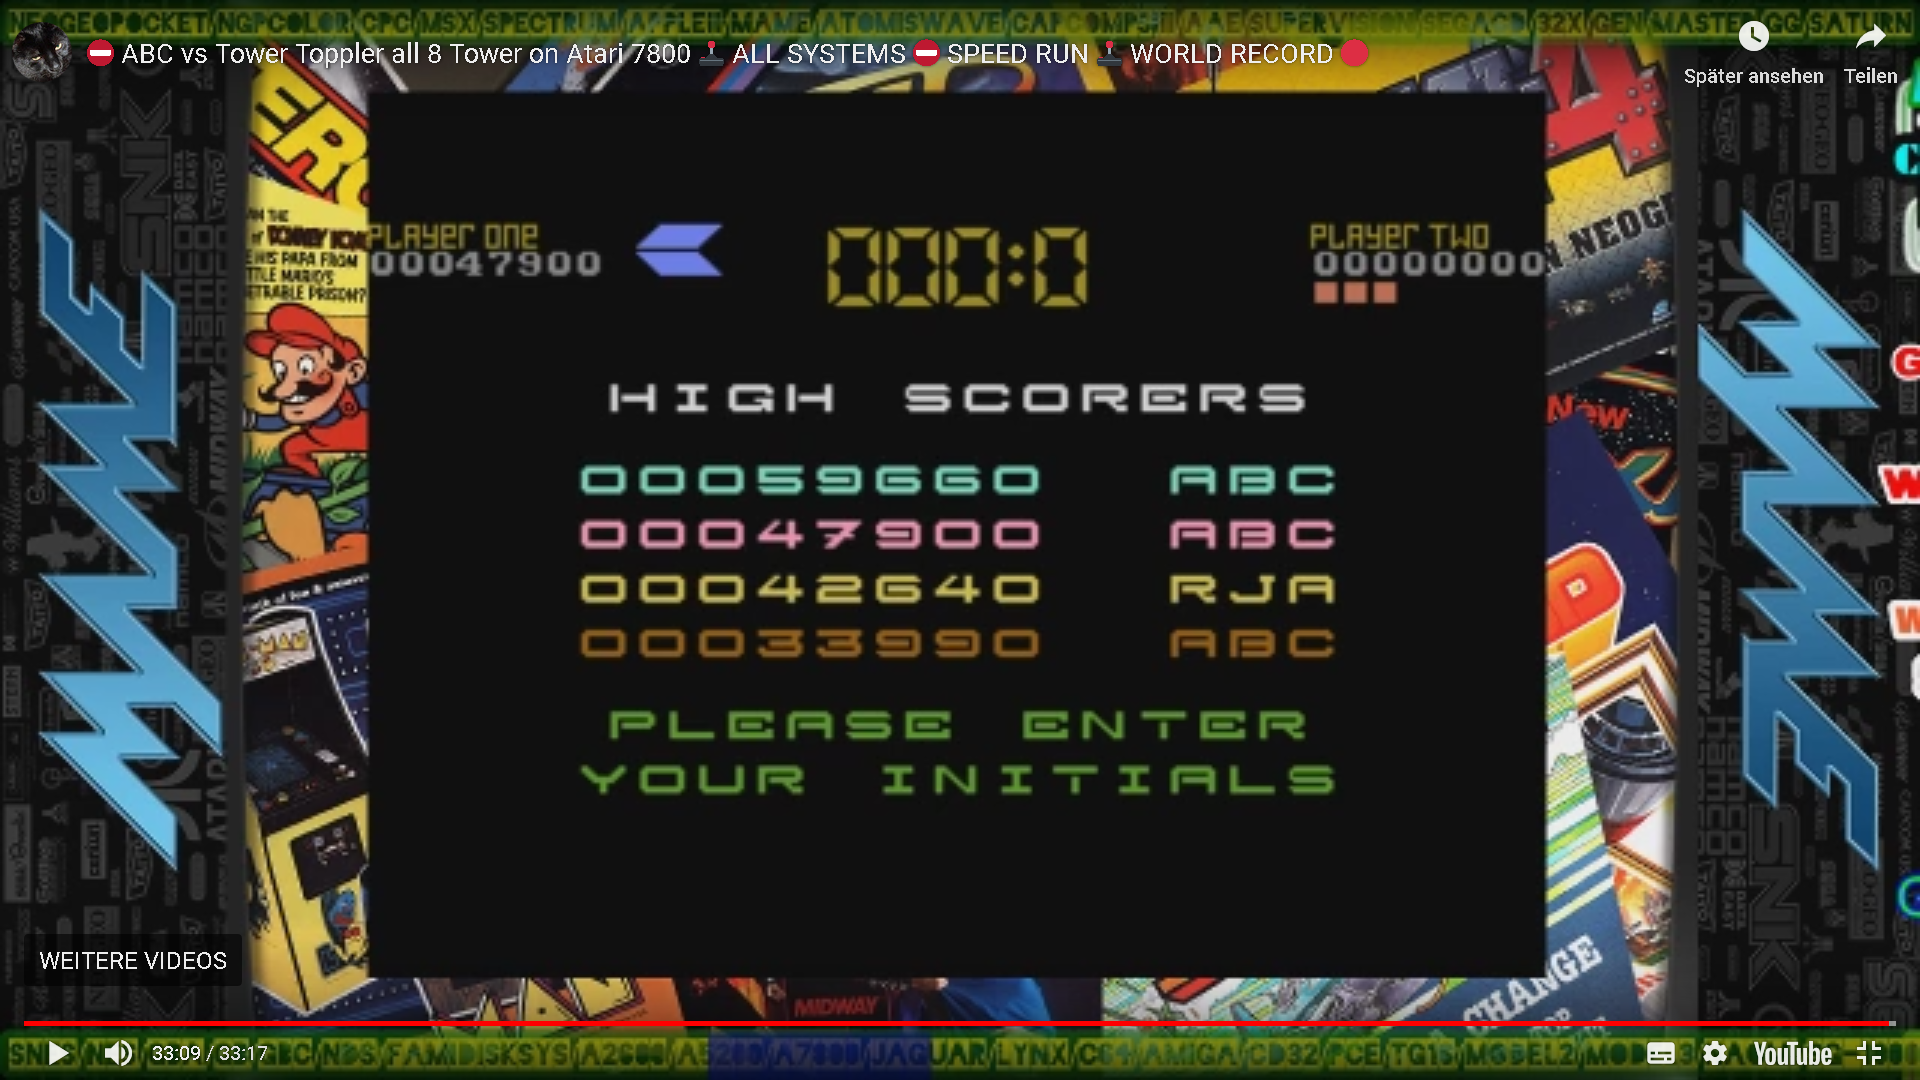 ArcadePlayerABC: Tower Toppler (Atari 7800 Emulated) 47,900 points on 2019-12-16 05:26:24